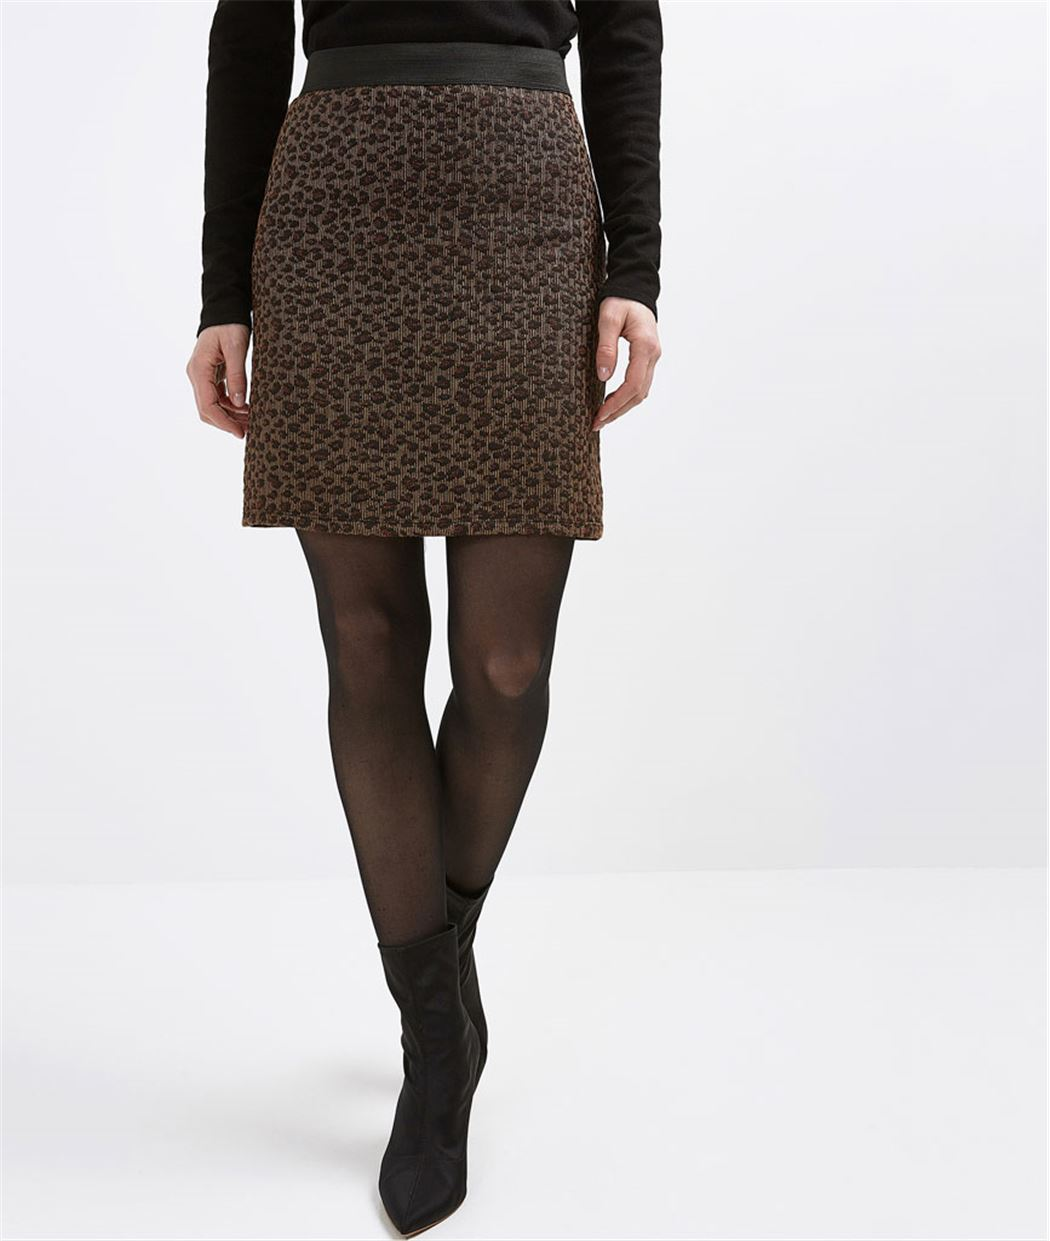 jupe femme courte maille jacquard marron grain de malice. Black Bedroom Furniture Sets. Home Design Ideas